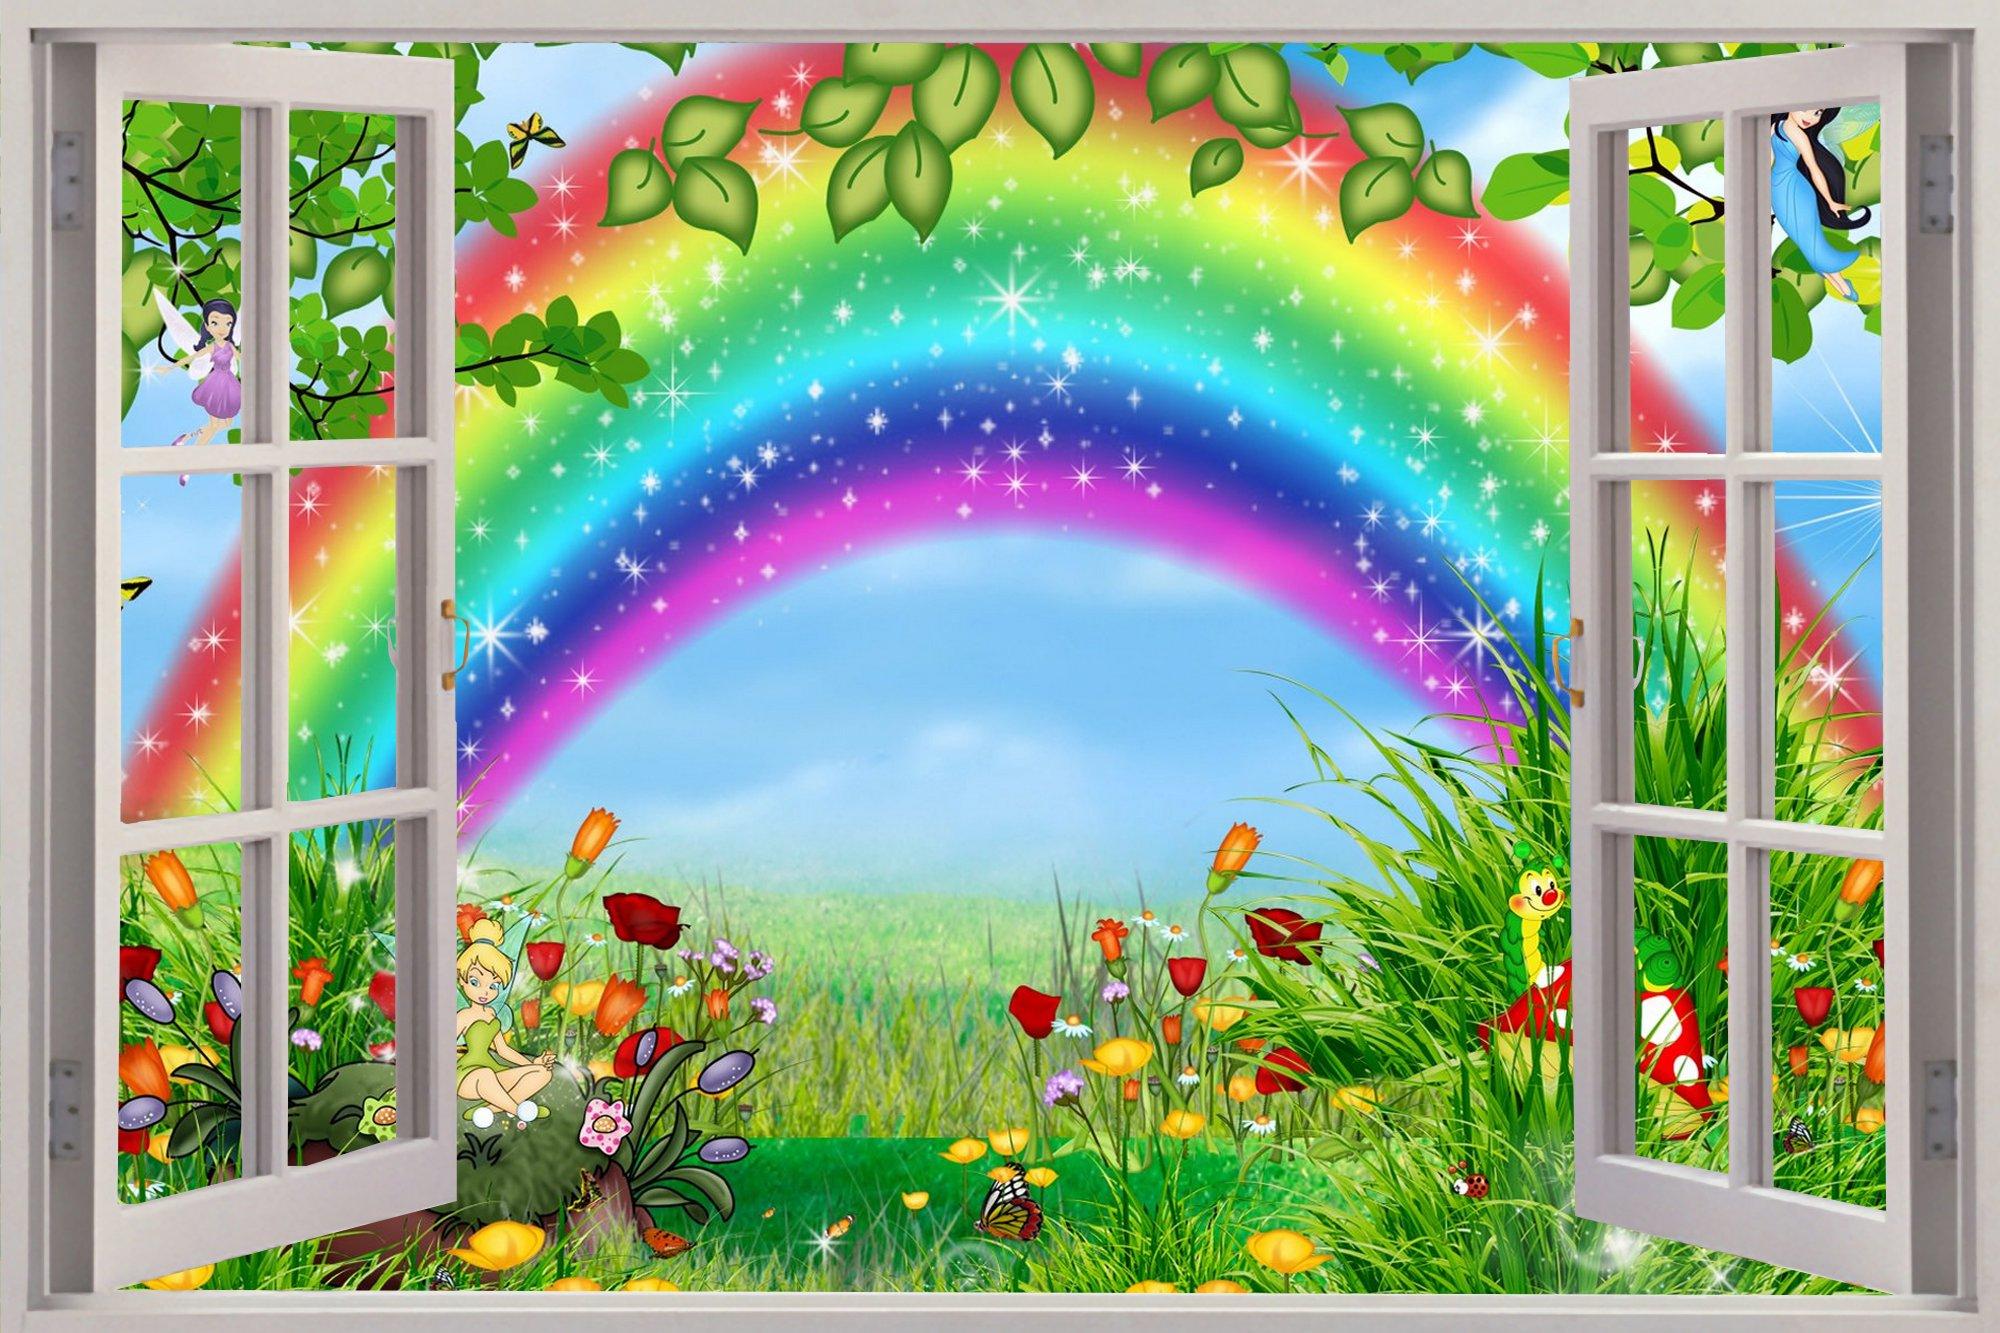 wallpaper decal wallpapersafari window childrens fairytale rainbow view wall stickers